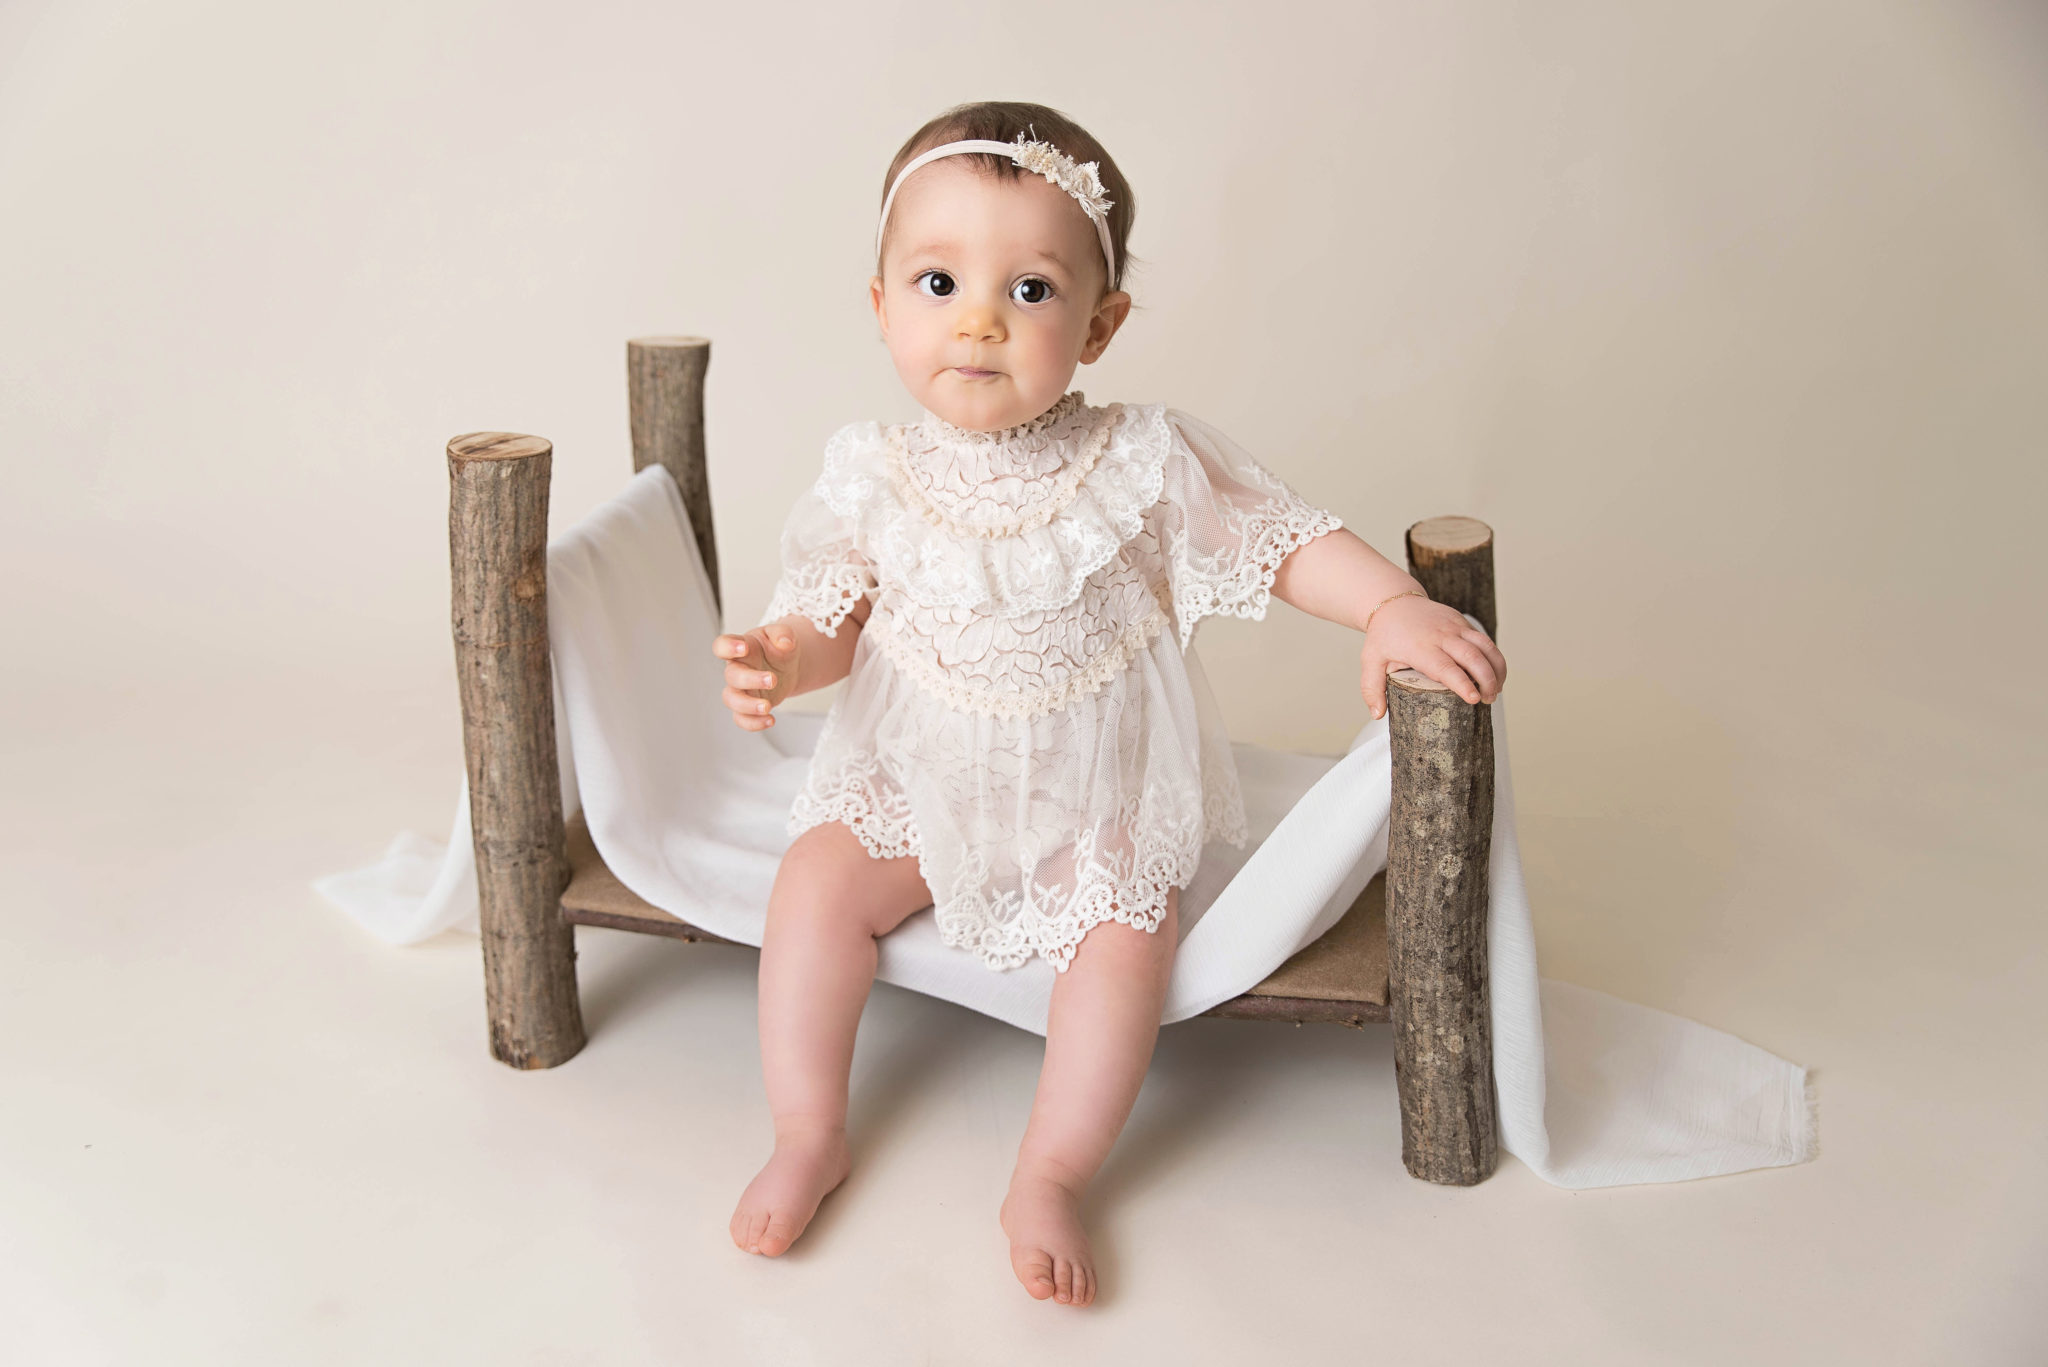 Photographe bébé oise seine et marne val d'oise ainse (2)